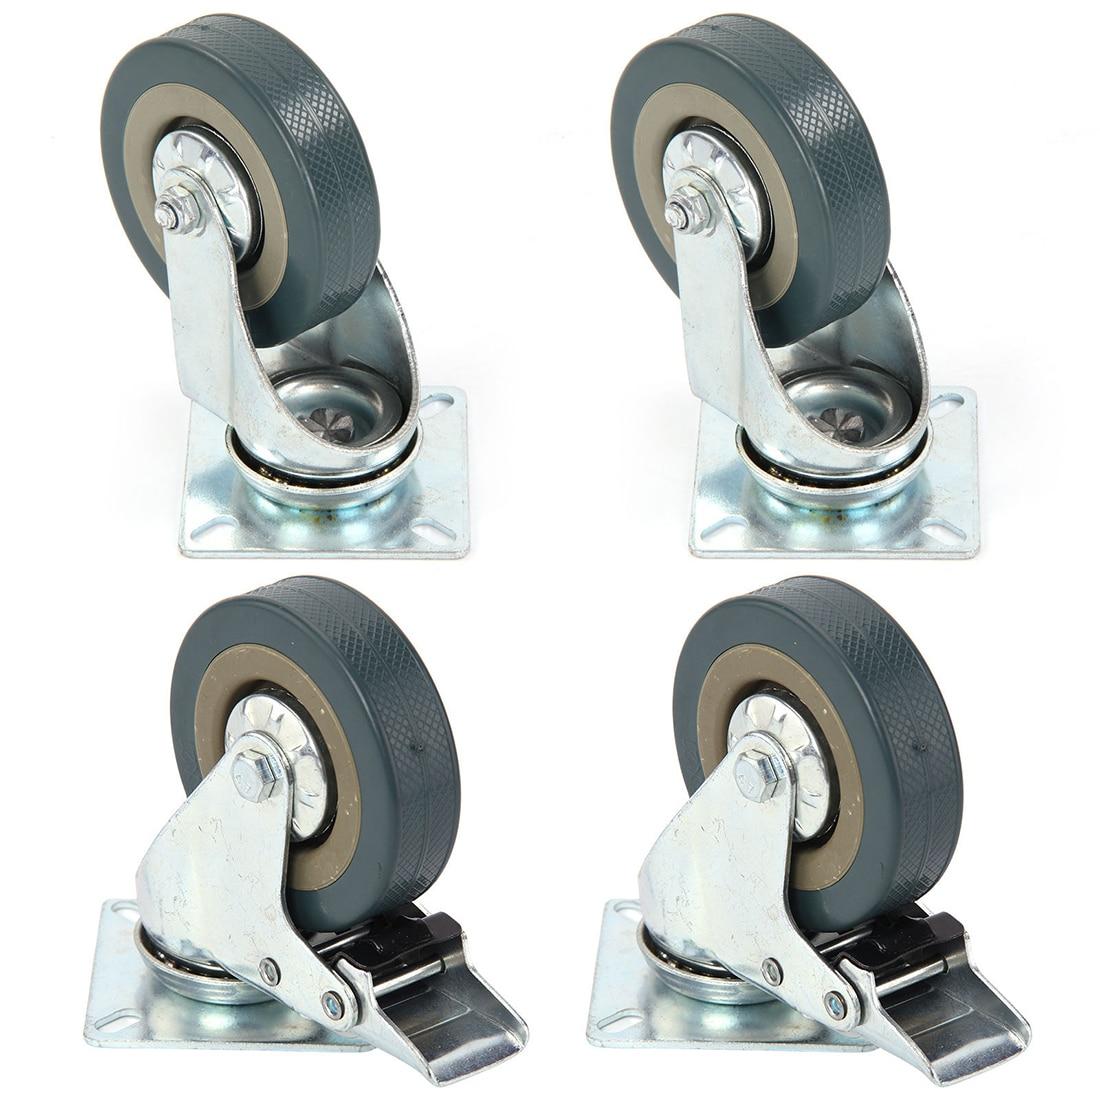 Set of Heavy Duty 125x27mm Rubber Swivel Castor Wheels Trolley Caster Brake 100KGModel:2 with brake +2without brake ys 138no nc ansi standard heavy duty electric strike size 124 x 32 x 33 mm